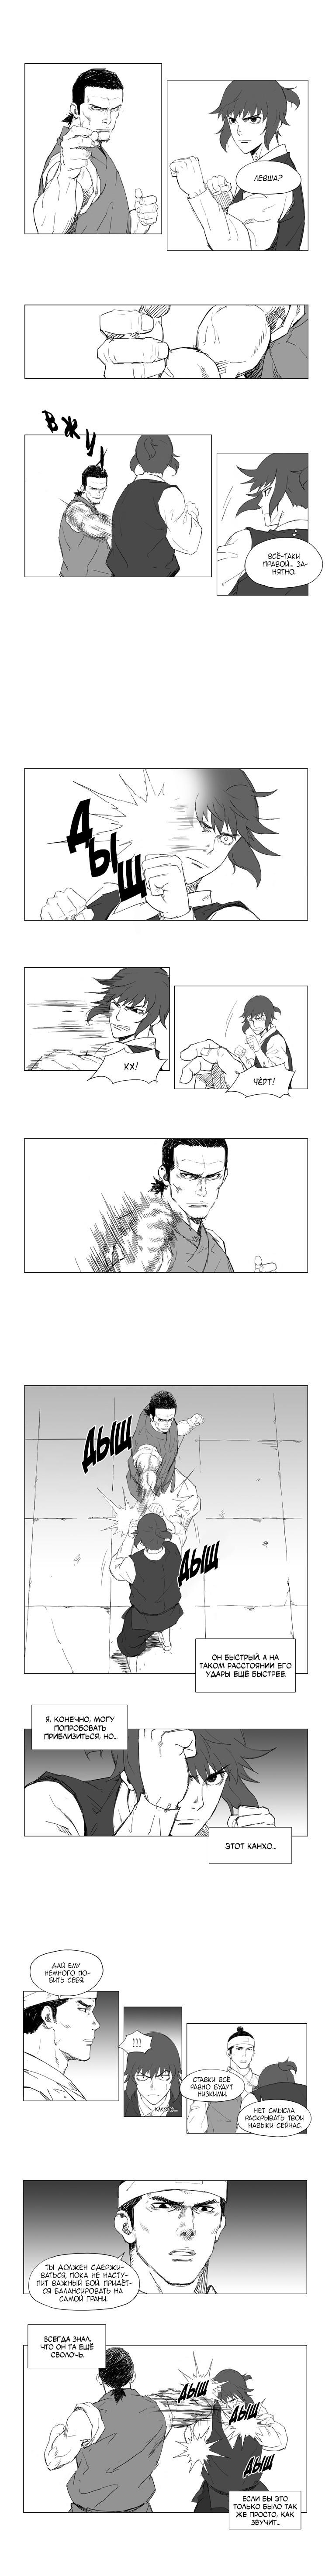 https://r1.ninemanga.com/comics/pic2/39/28263/288458/146007416088.jpg Page 3